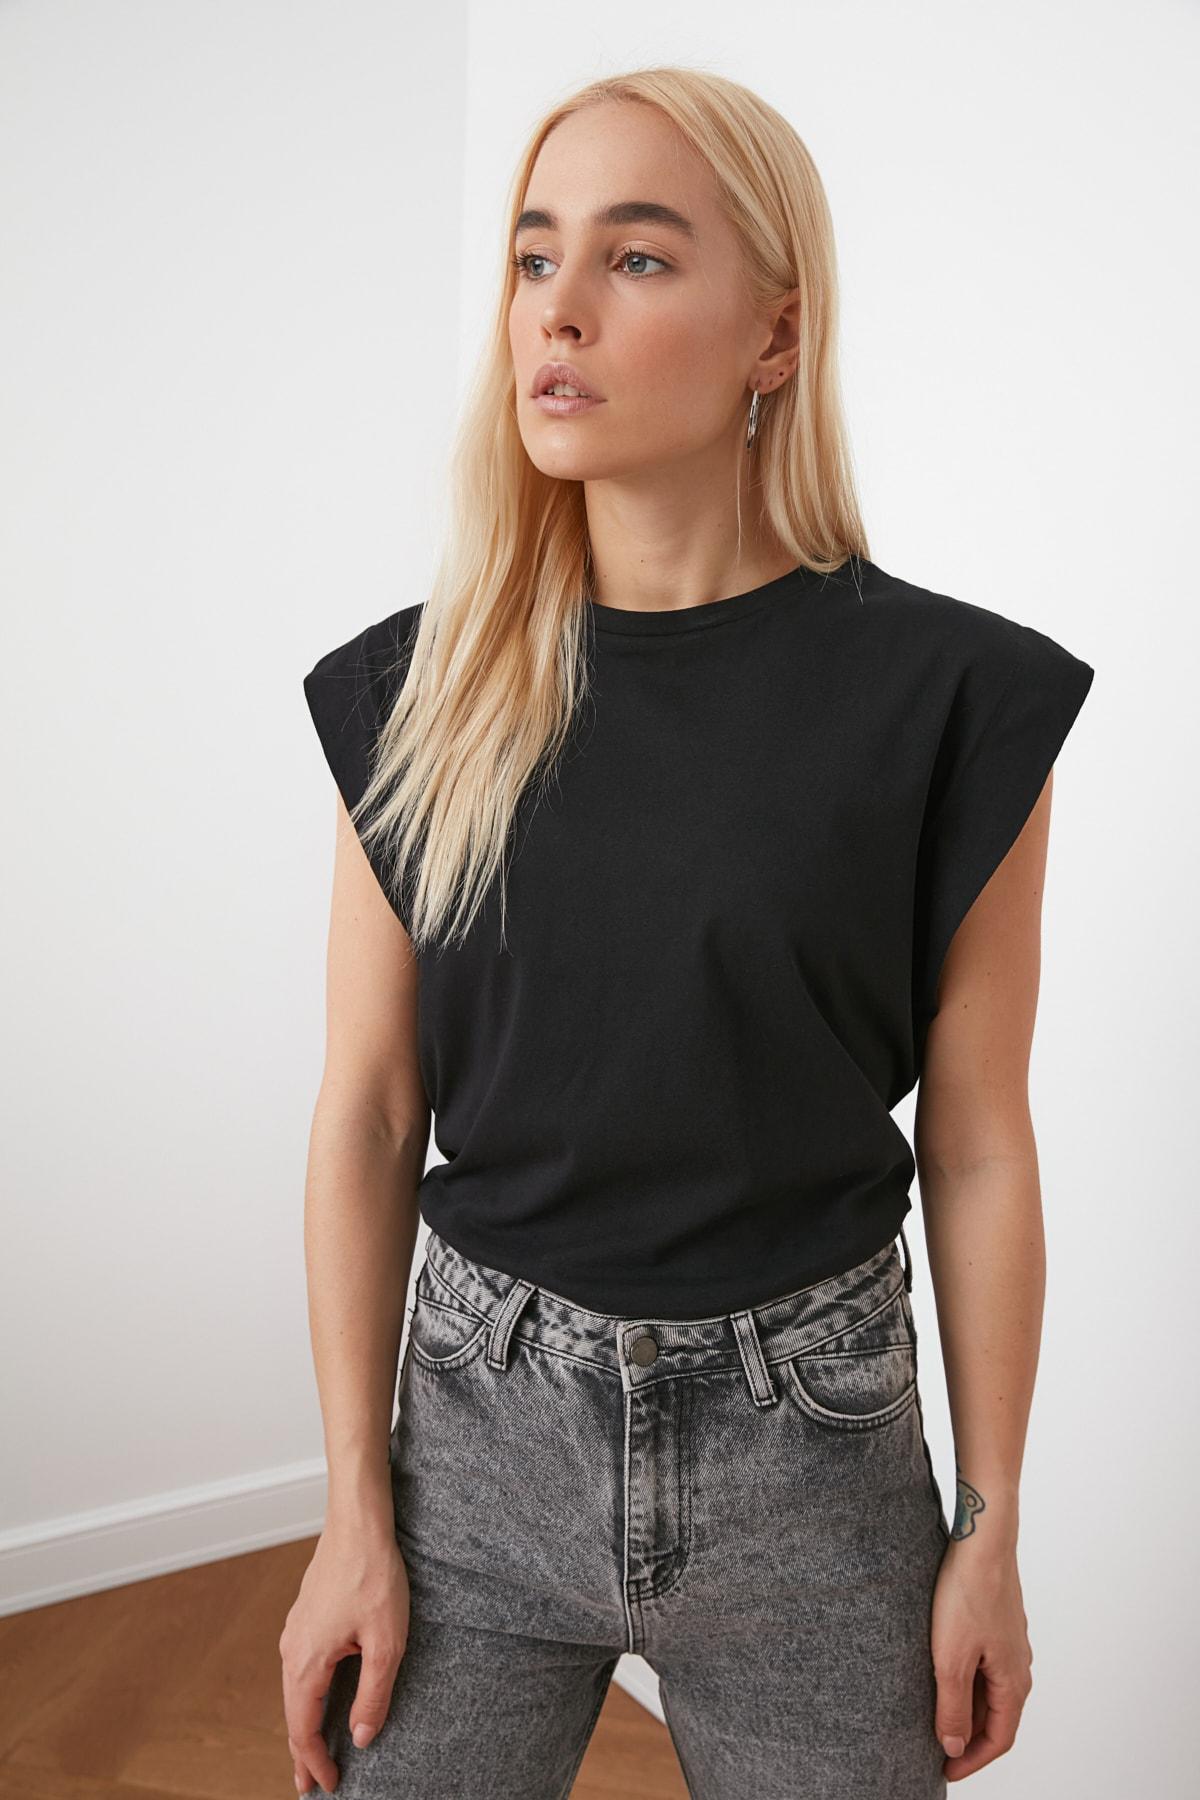 Trendyol Sleeveless Basic Knitted T-Shirt TWOSS20TS0021 футболка топ crop top футболка женский camisetas de mujer ropa mujer майка